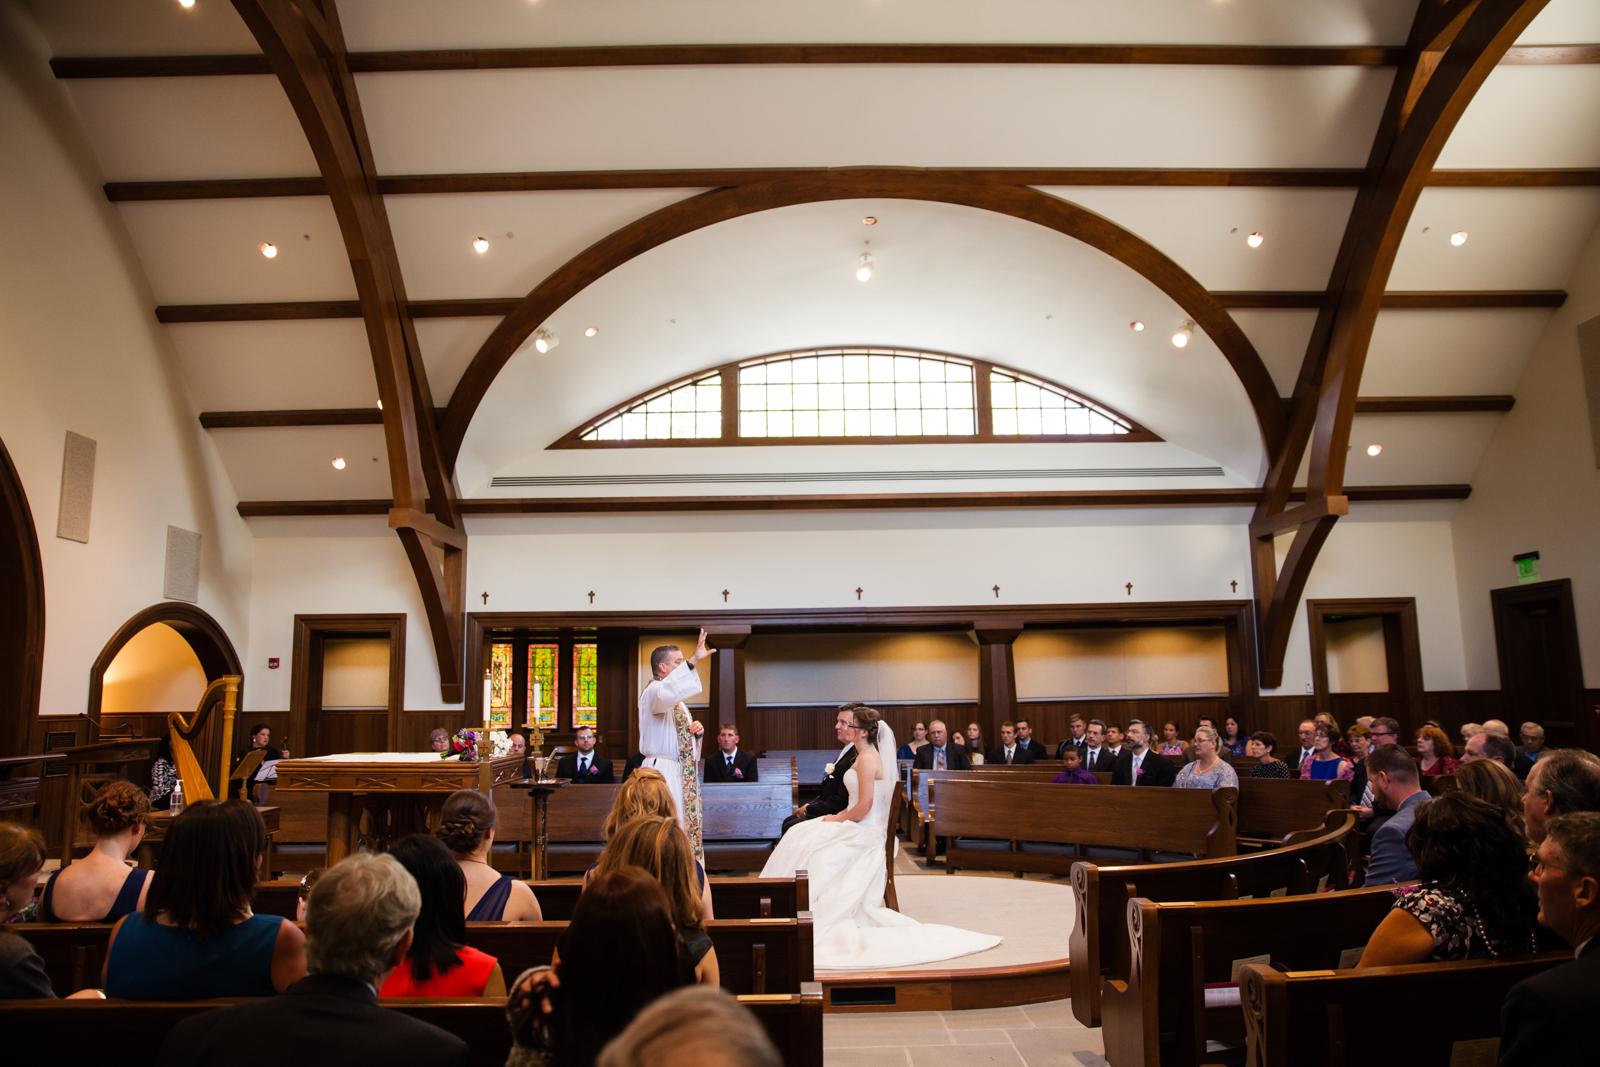 Eastons-Beach-Rotunda-Ballroom-Wedding-Newport-Rhode-Island-PhotographybyAmandaMorgan-36.jpg